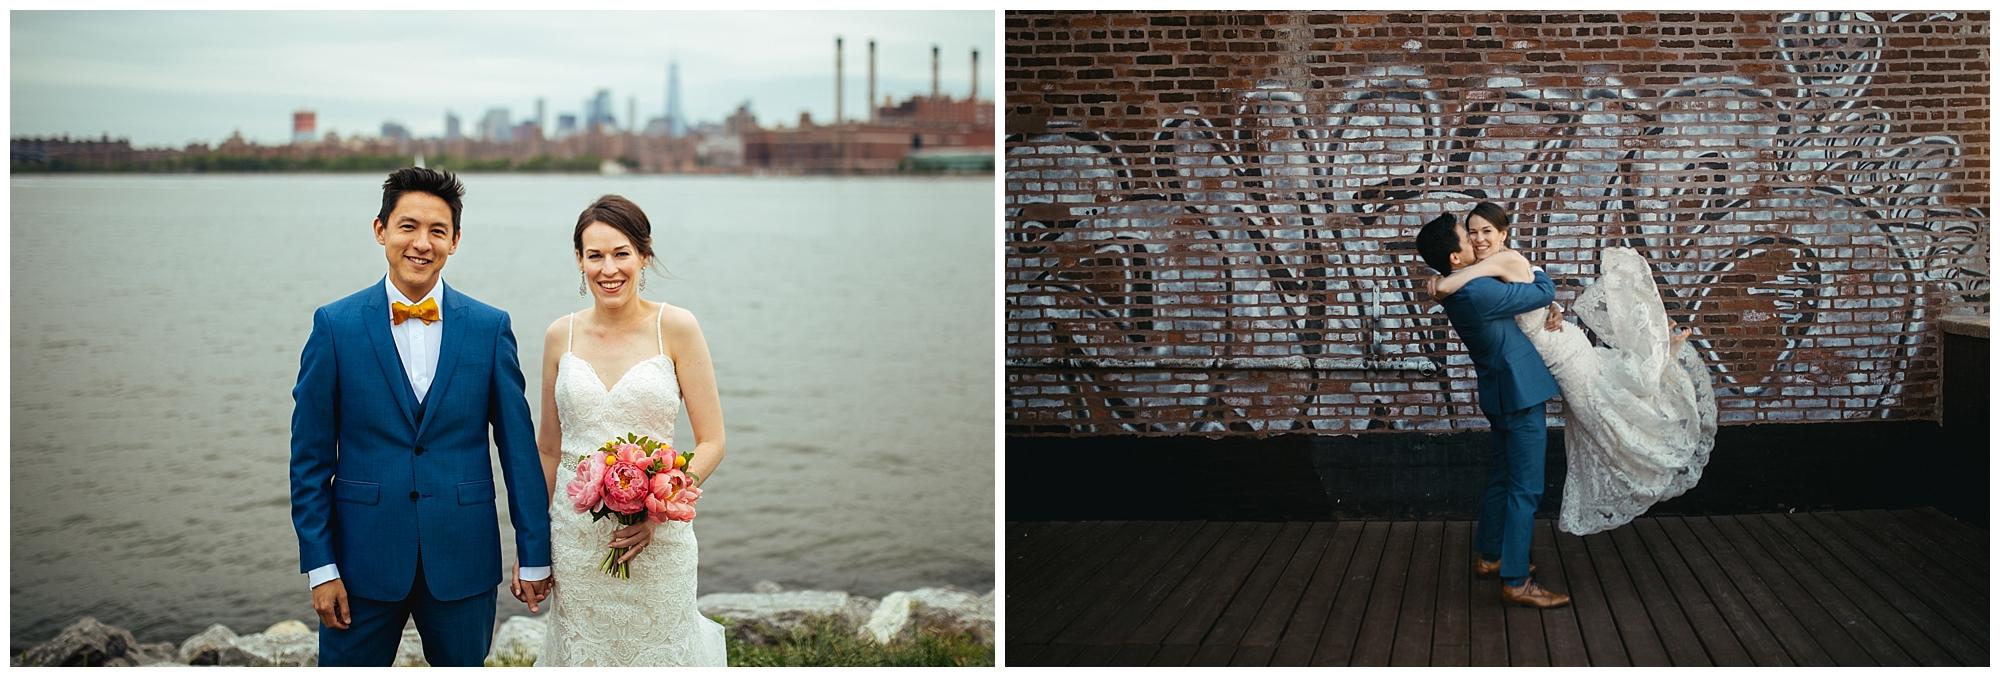 NYC-Wedding-Photographer33.jpg